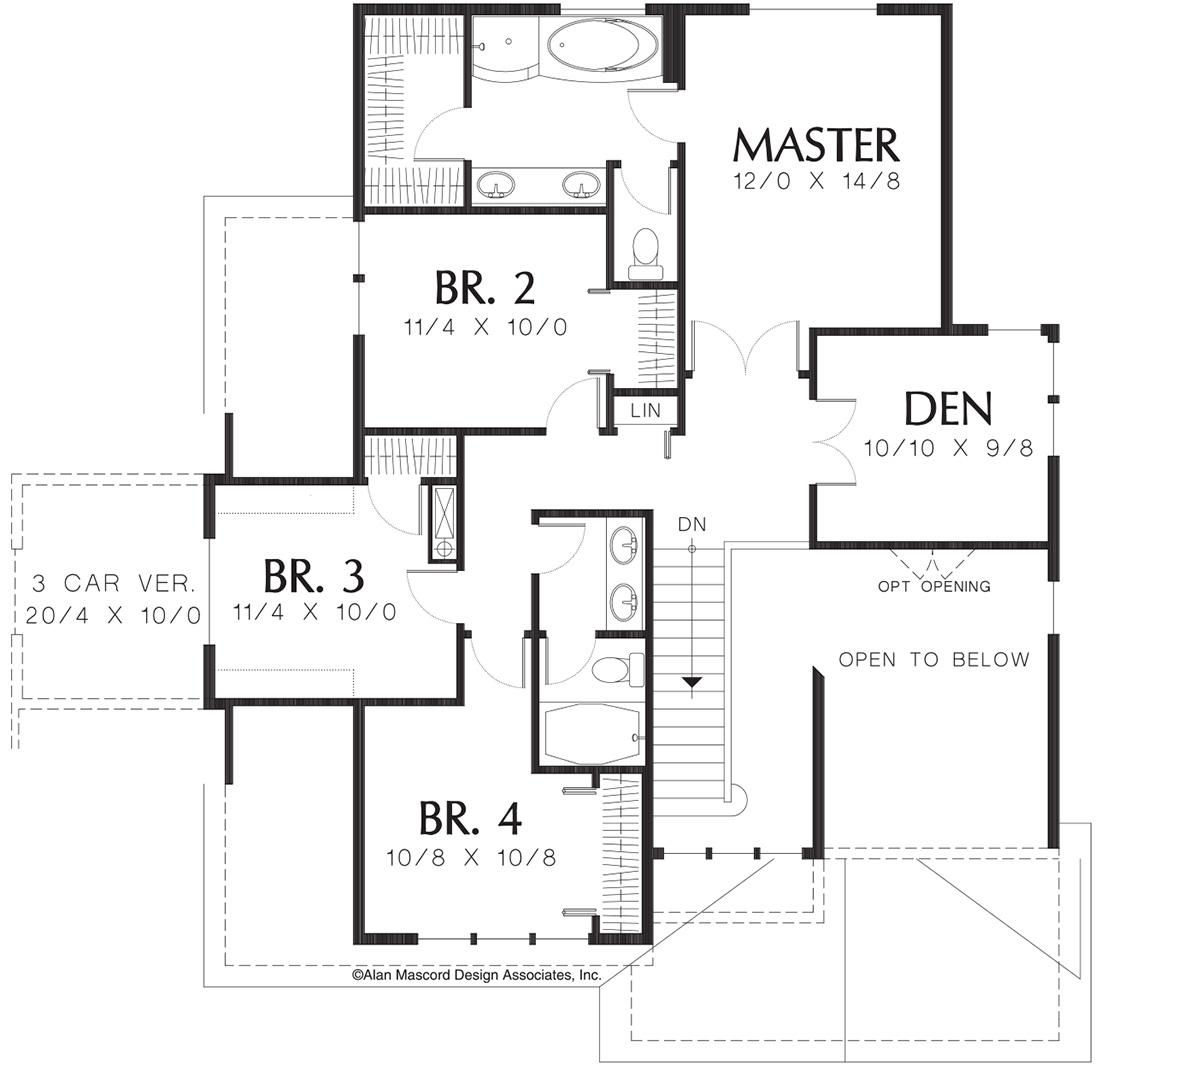 Bungalow Plan 2 173 Square Feet 4 Bedrooms 2 5